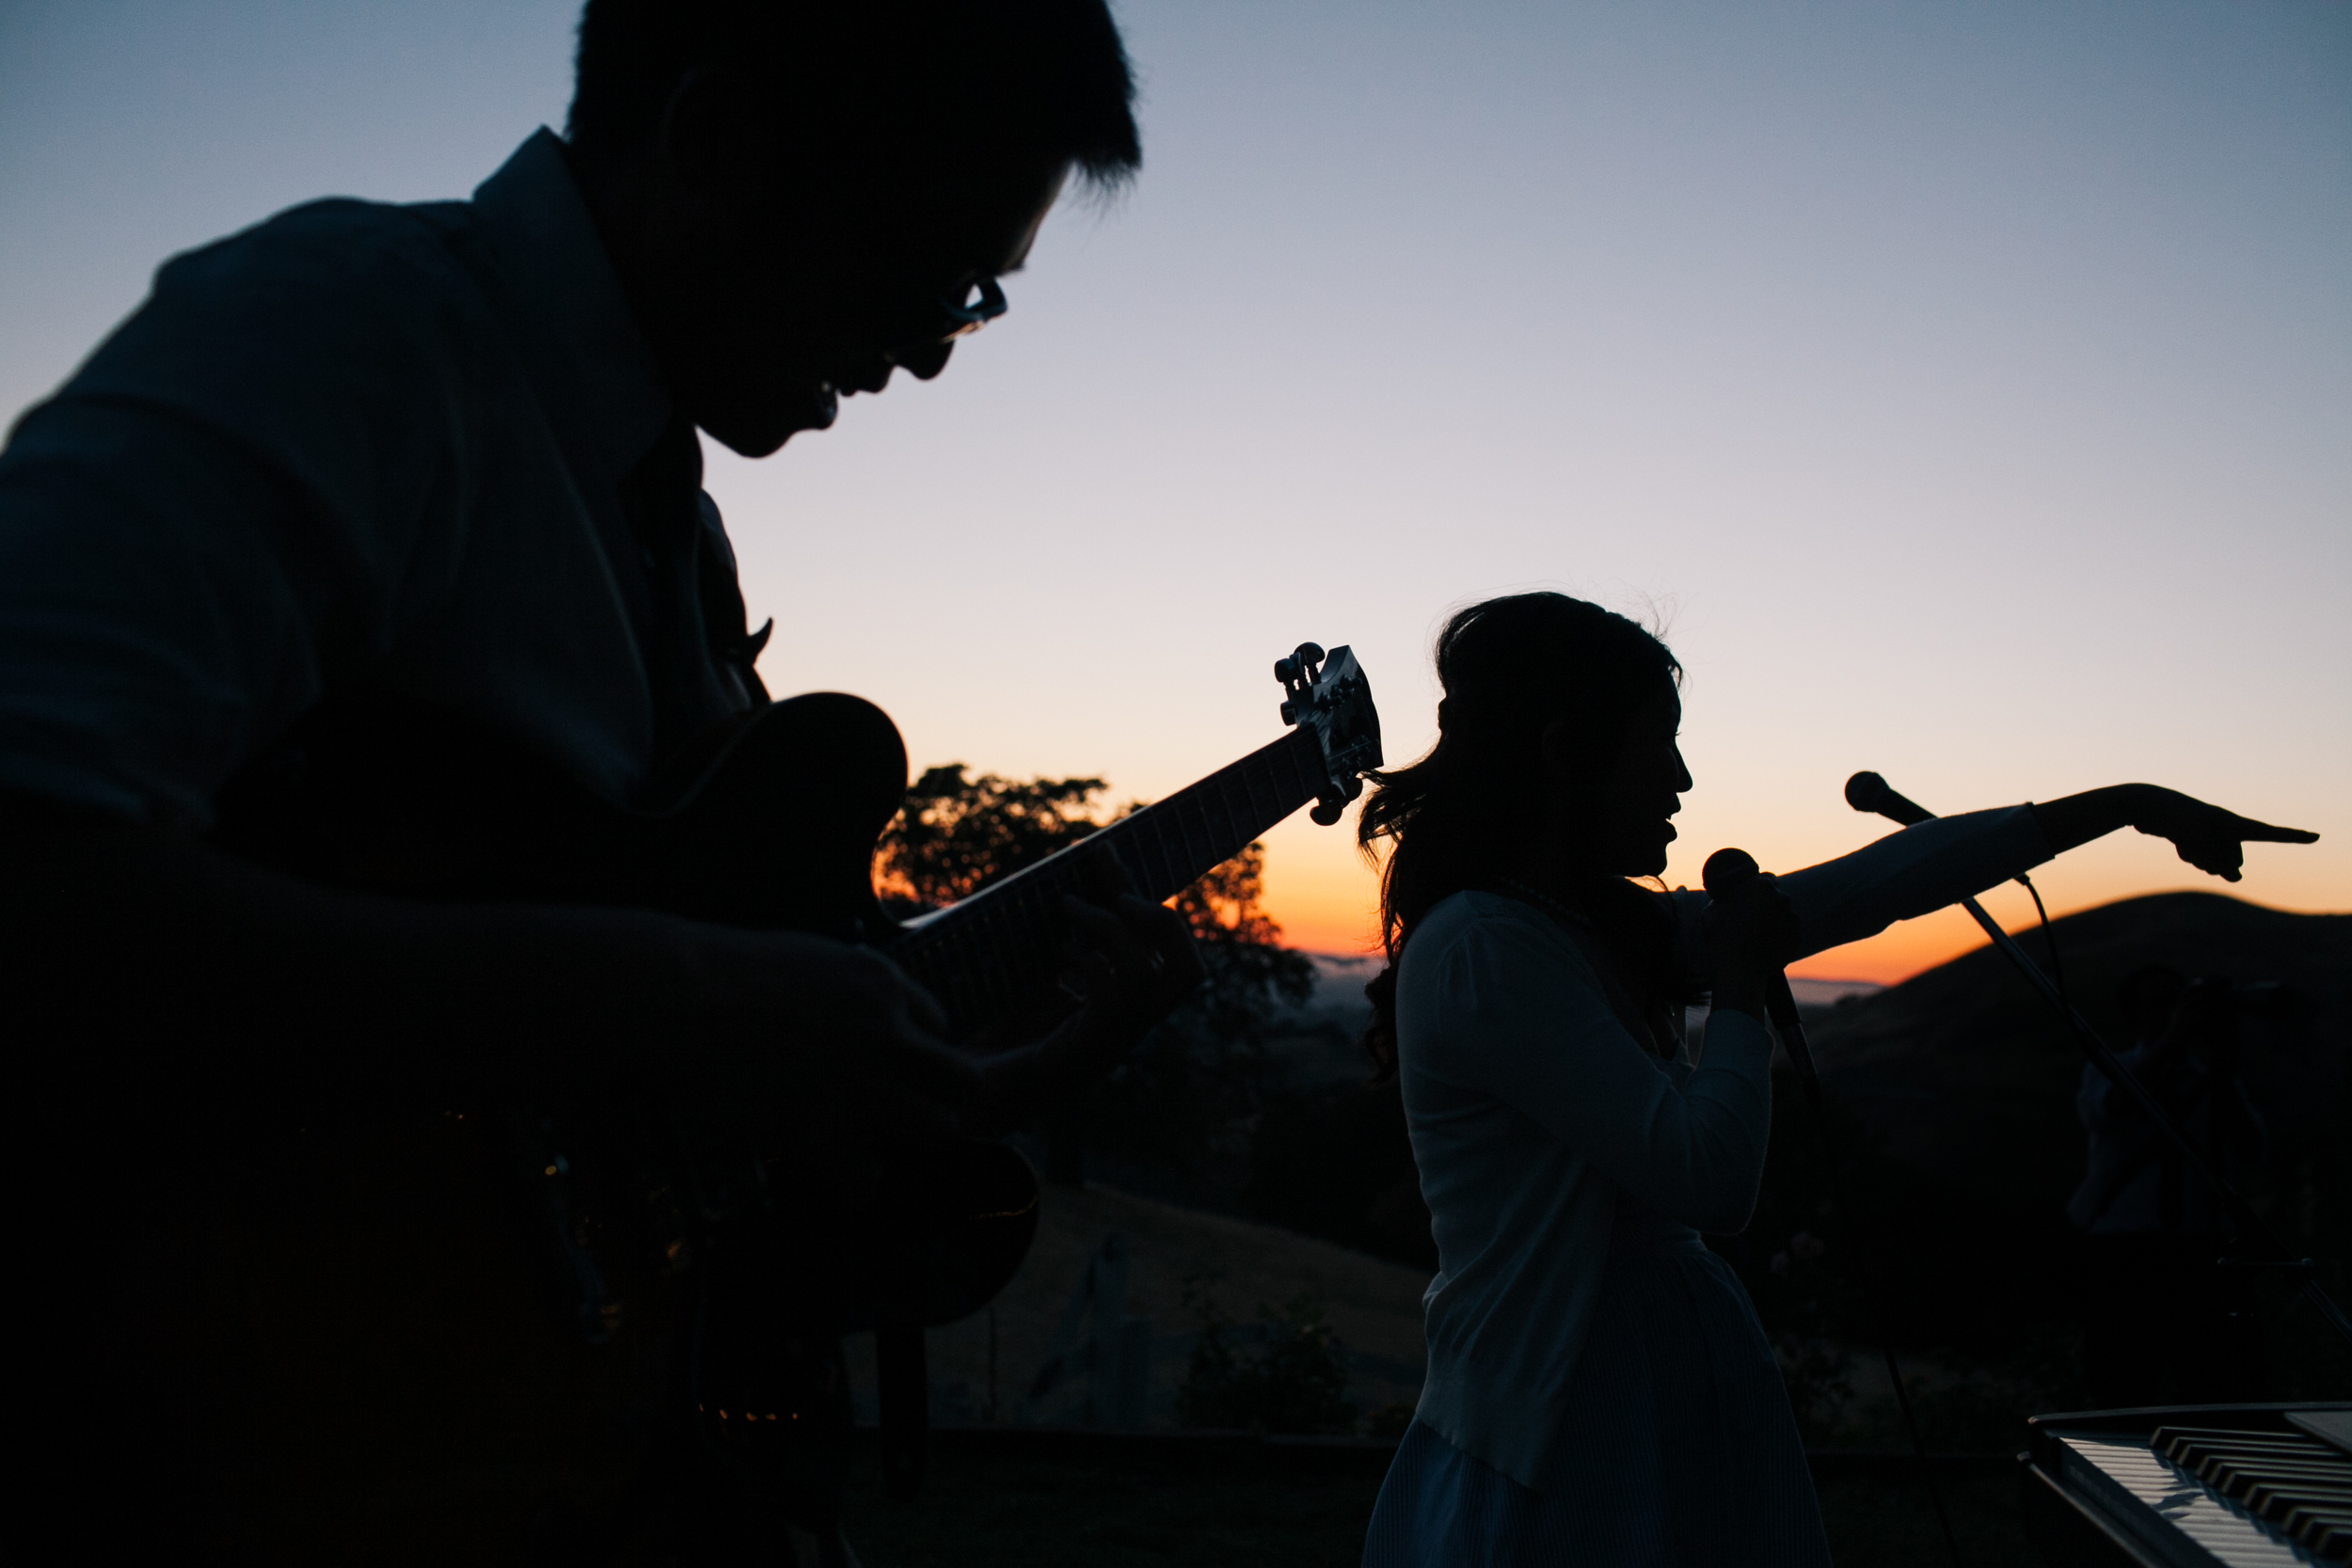 Diablo_Ranch_Wedding_Photography_Becky_Will-33.JPG